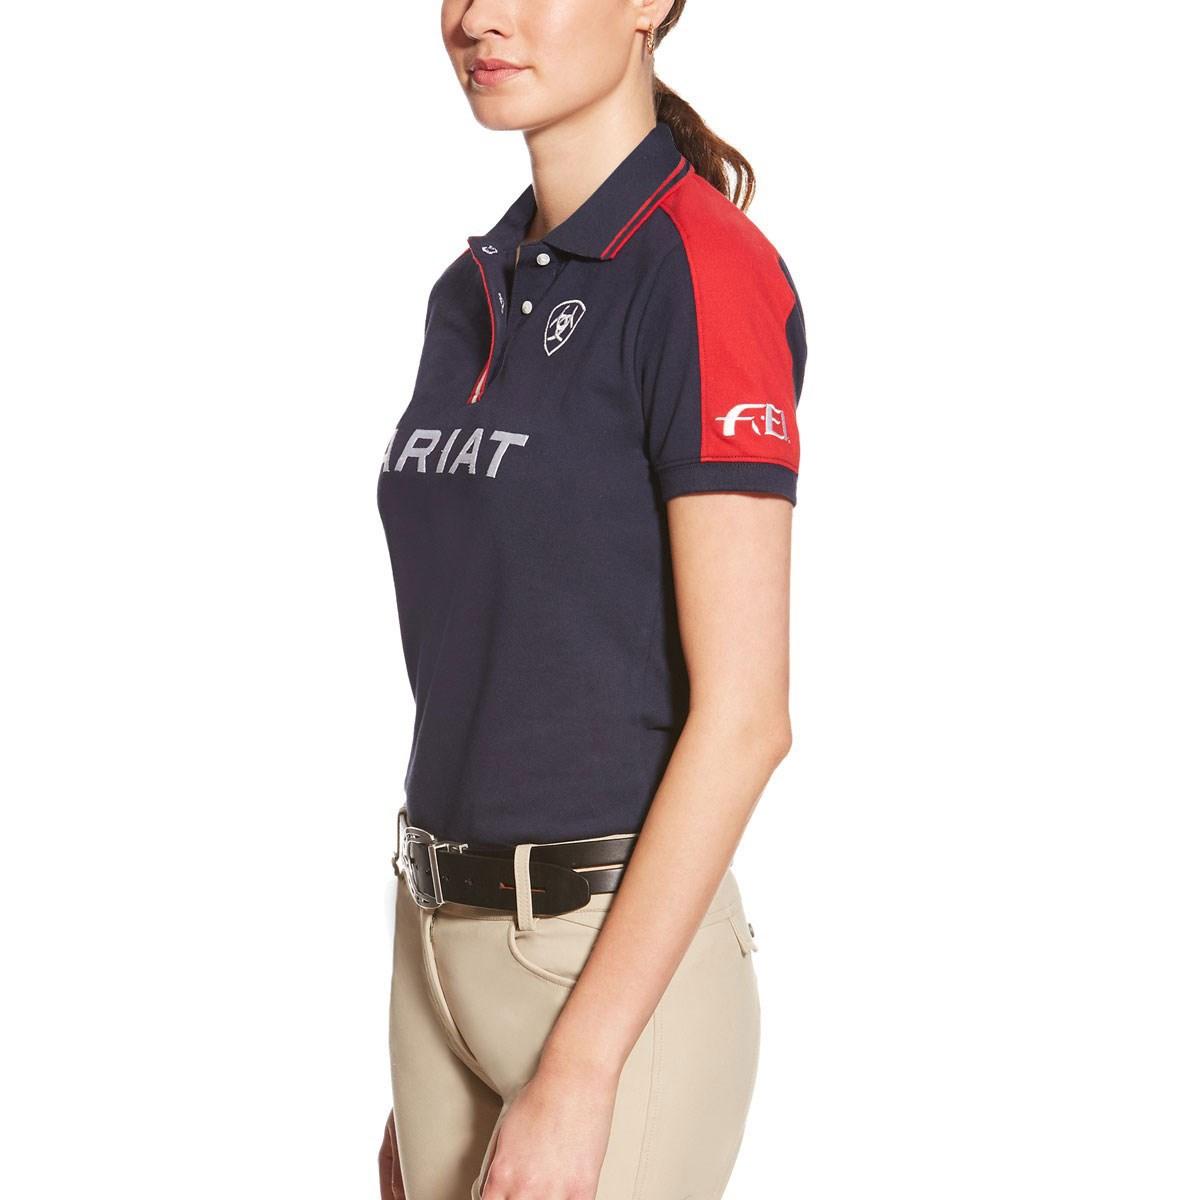 94c29b46 Ariat FEI New Team Polo Shirt Womens - Navy - Redpost Equestrian